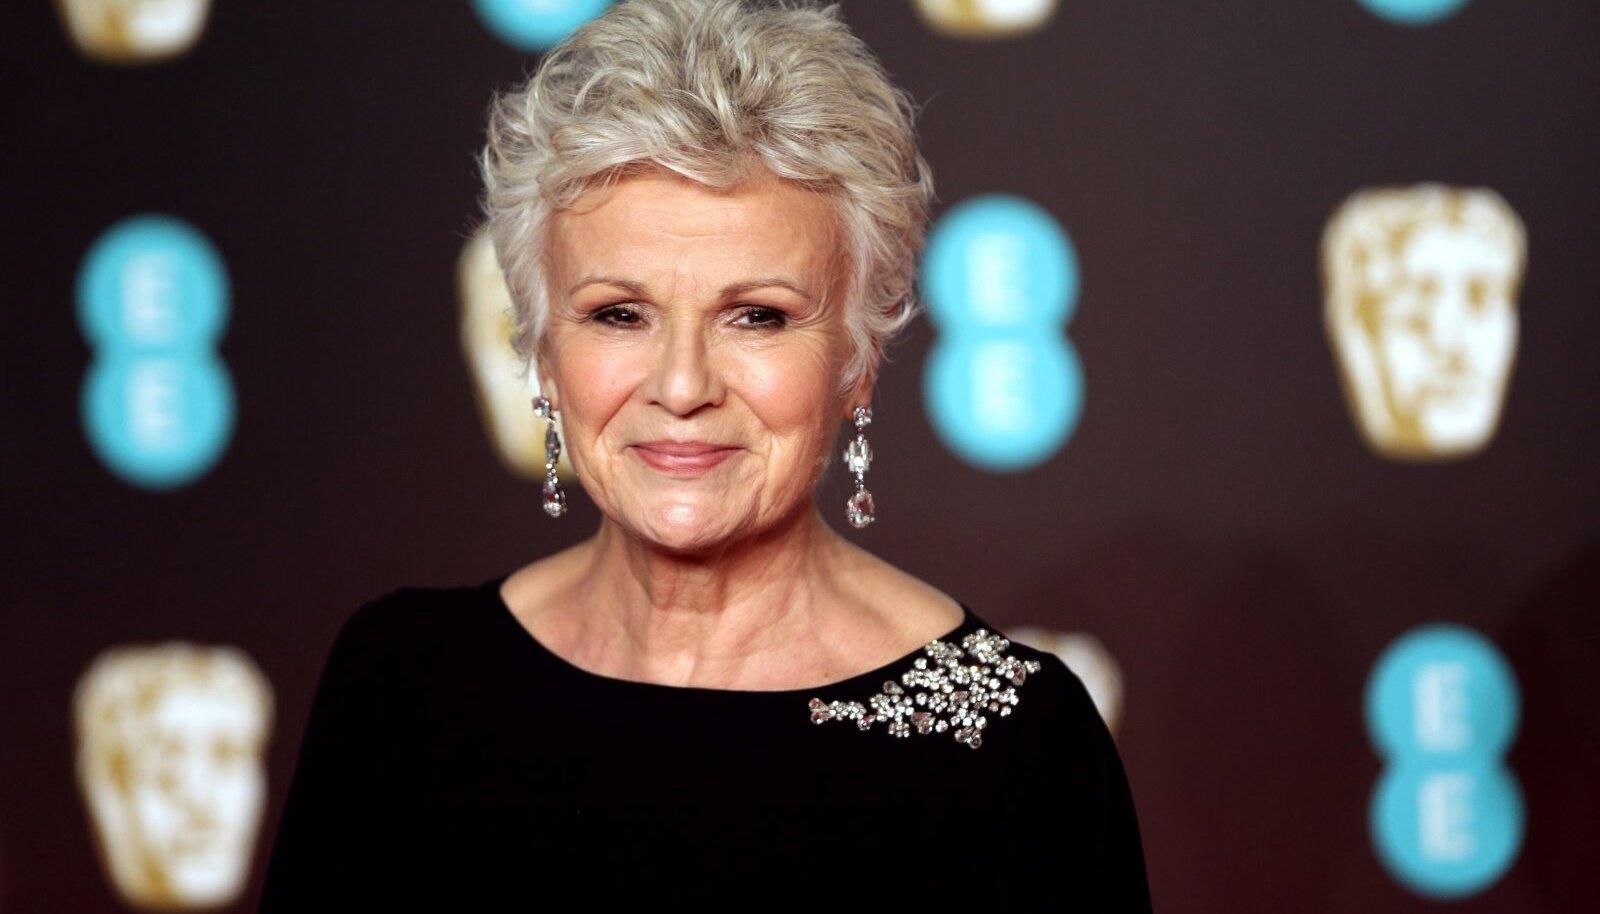 Dame Julie Walters bowel cancer diagnosis